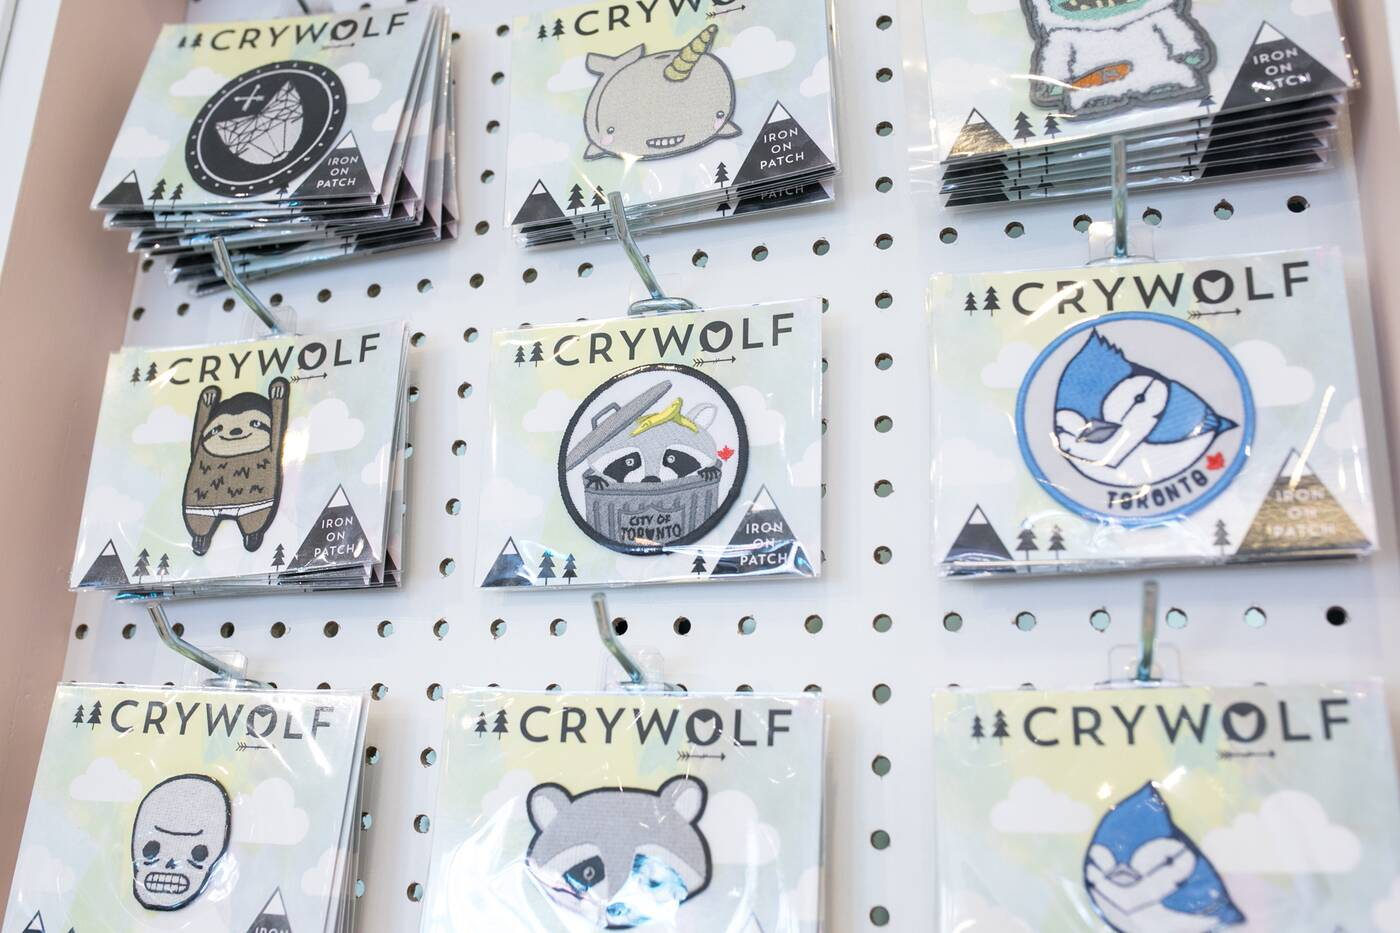 crywolf toronto